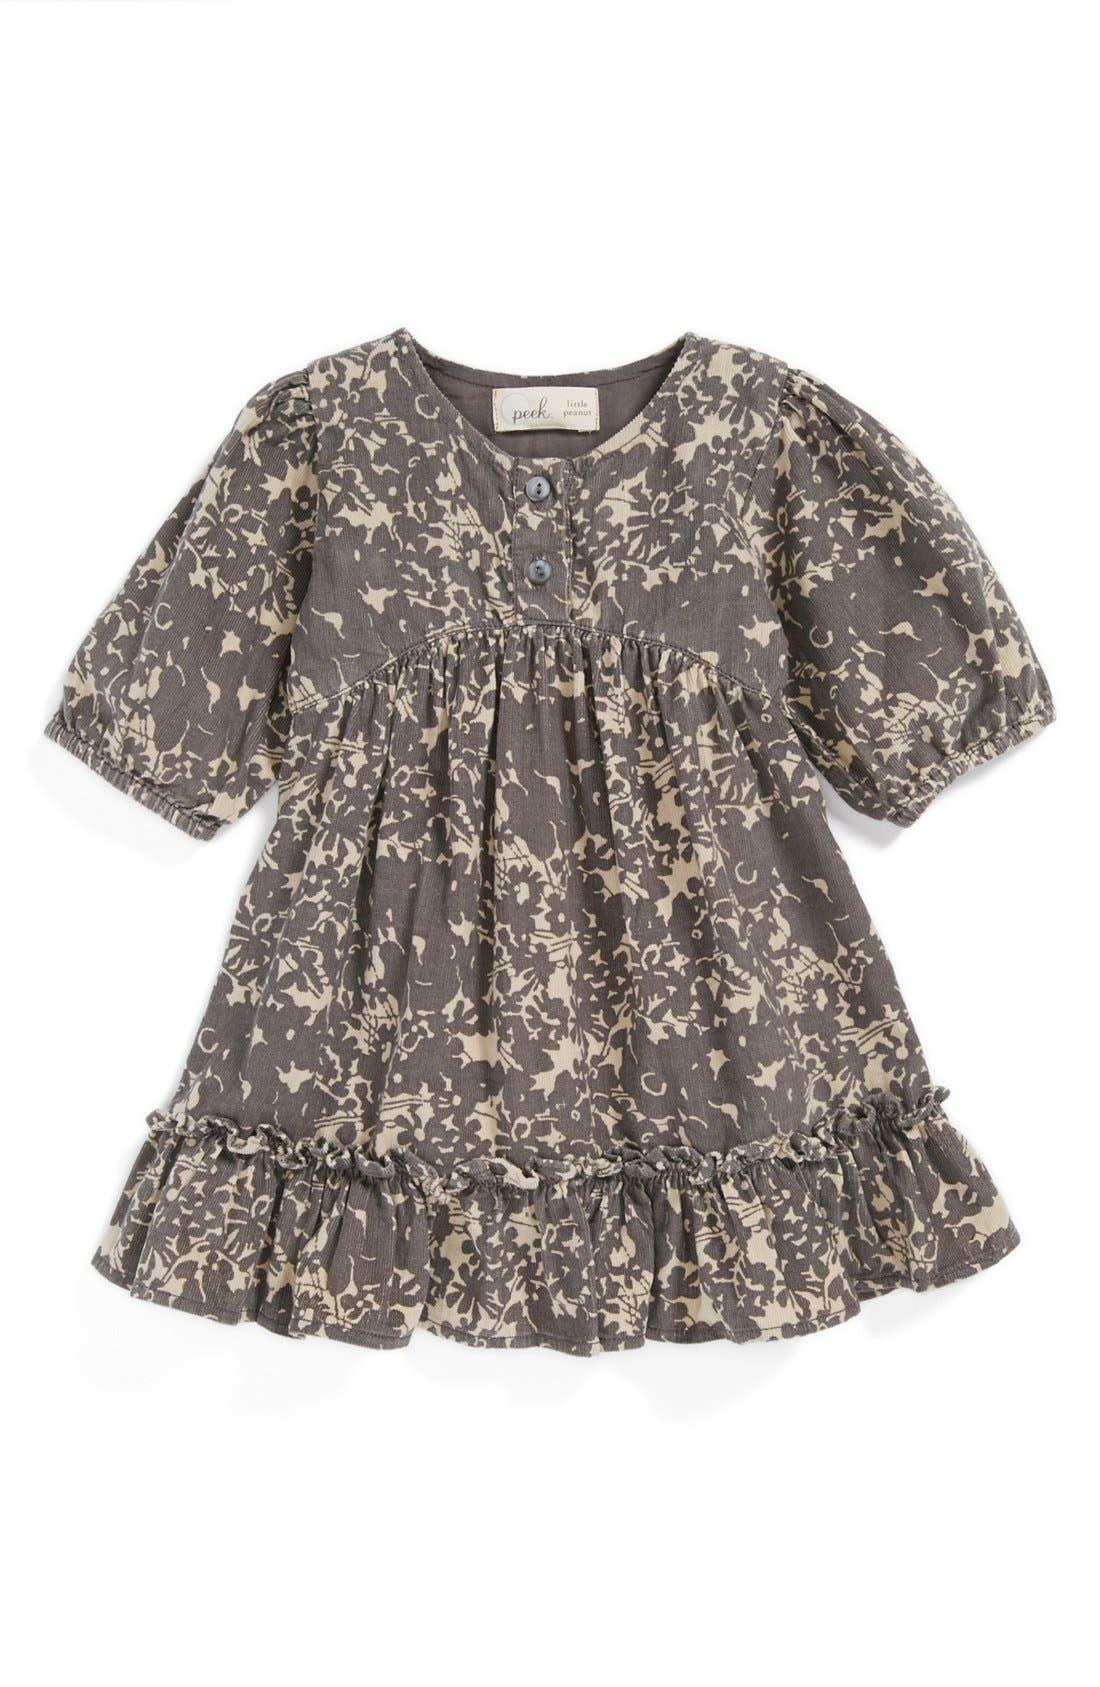 Main Image - Peek 'Savannah' Dress (Baby Girls)